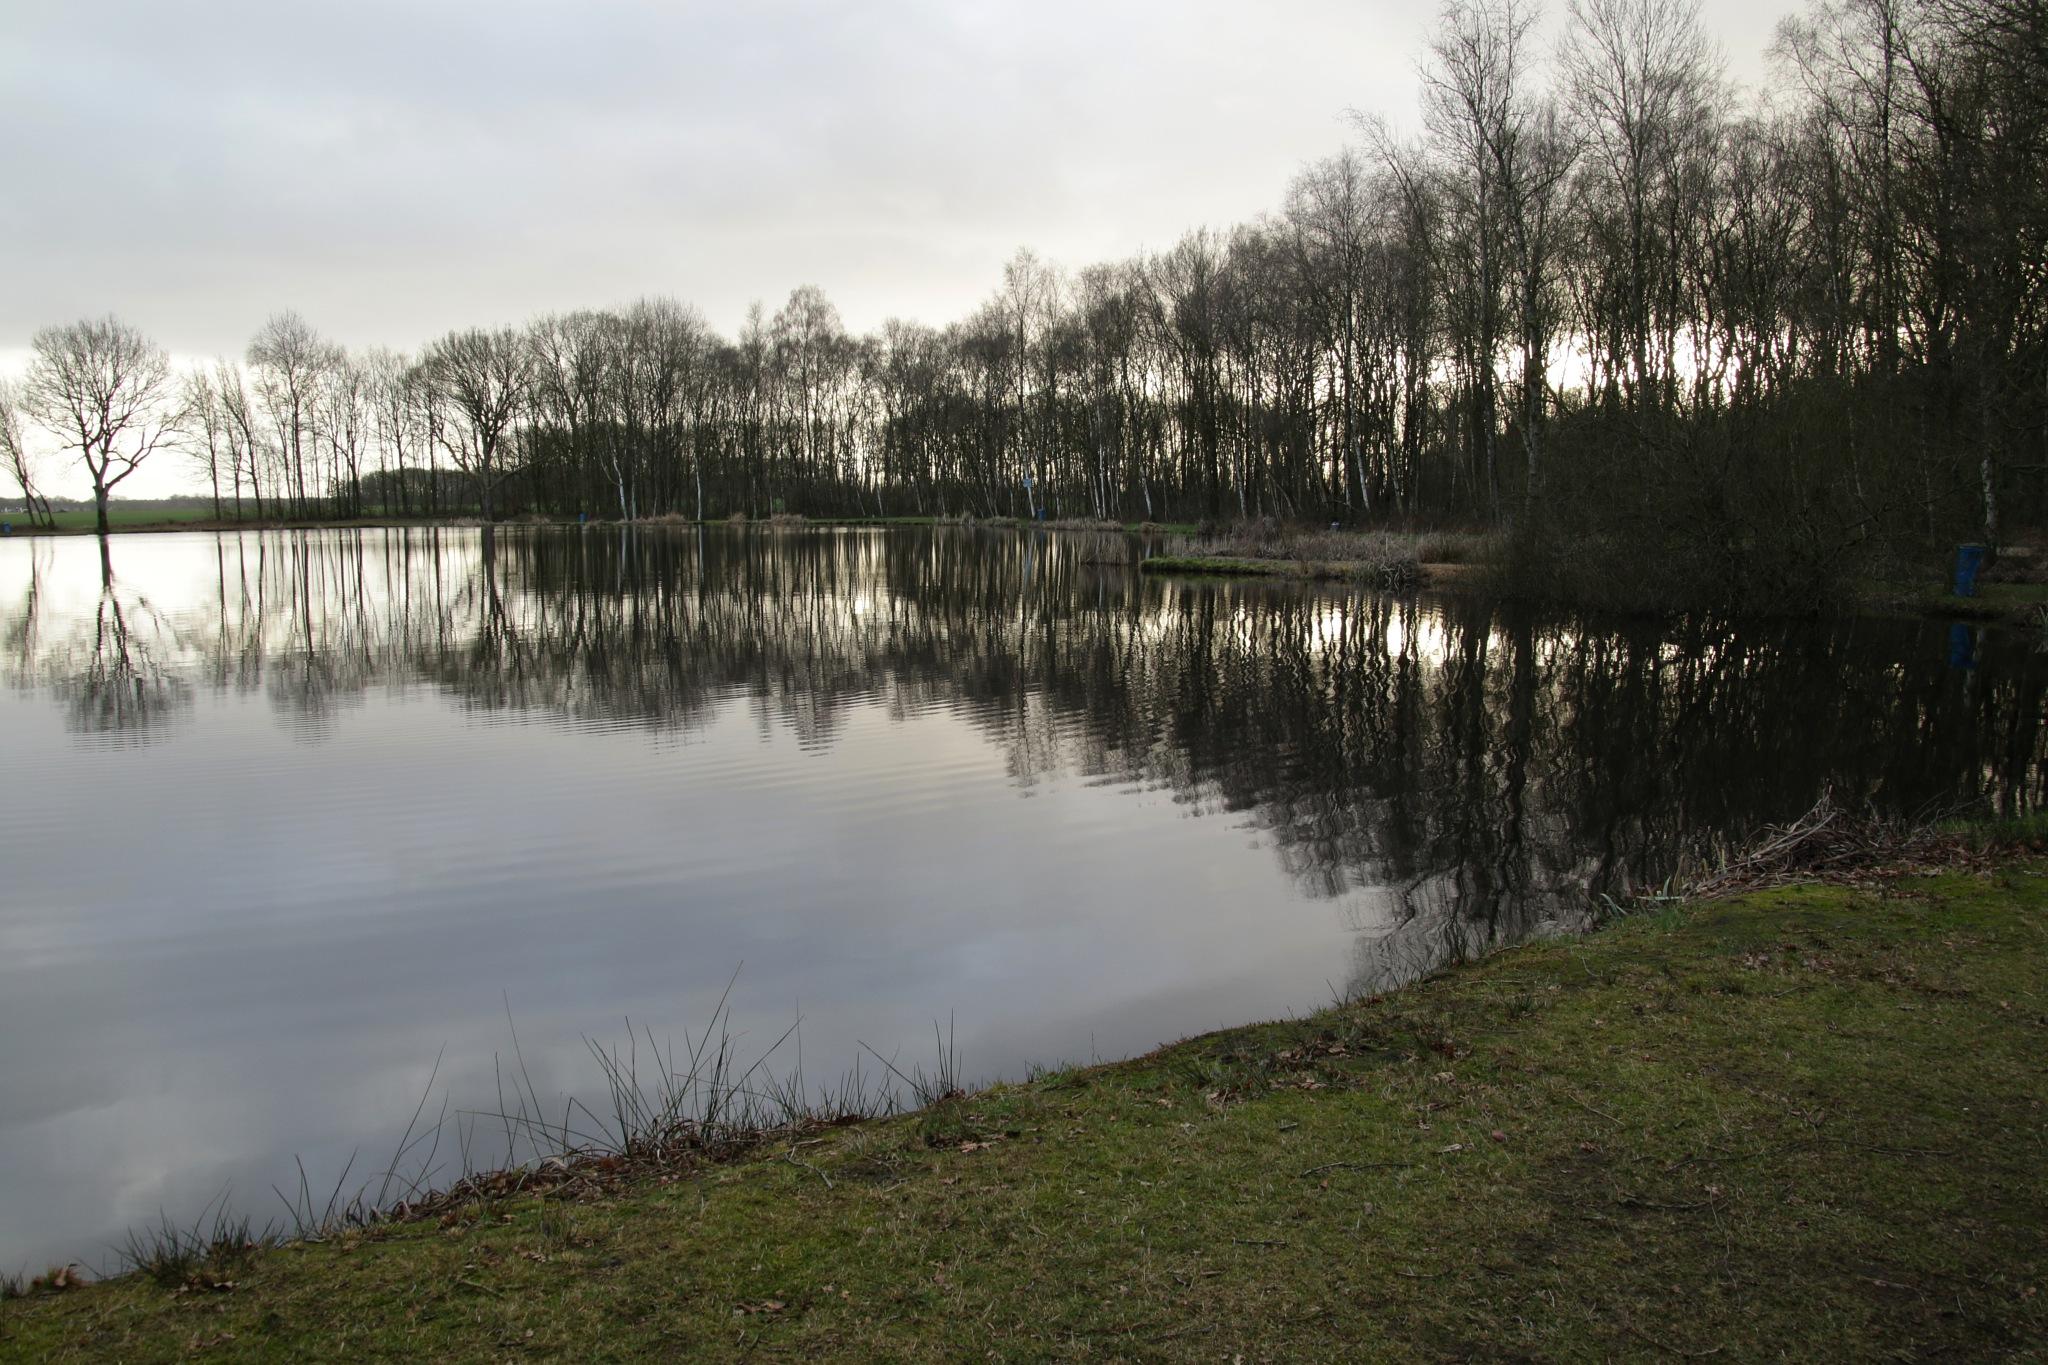 winterwalk 2 by Tineke Deuntje